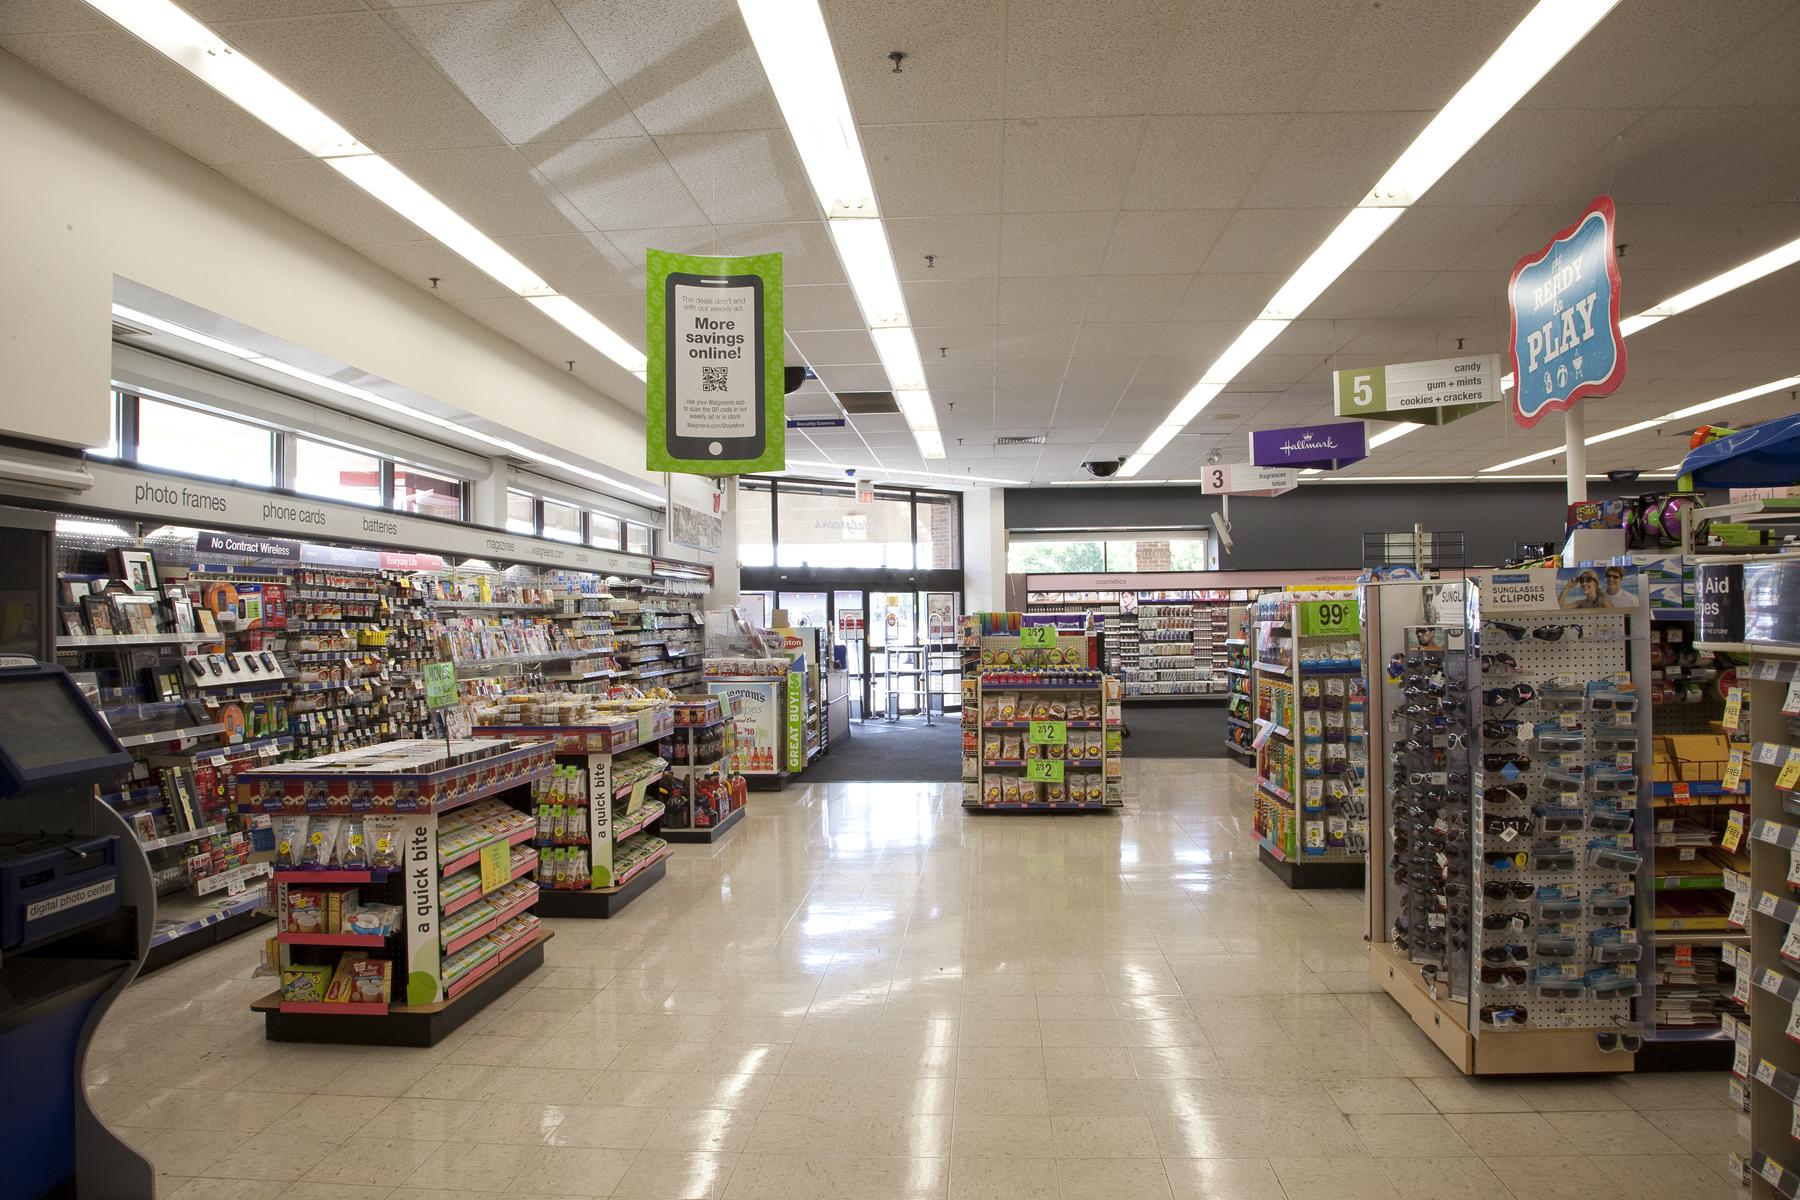 Lighting stores decoration news vibrant ge retail lighting and vibrant ge retail lighting and energy efficiency fills walgreens aloadofball Images